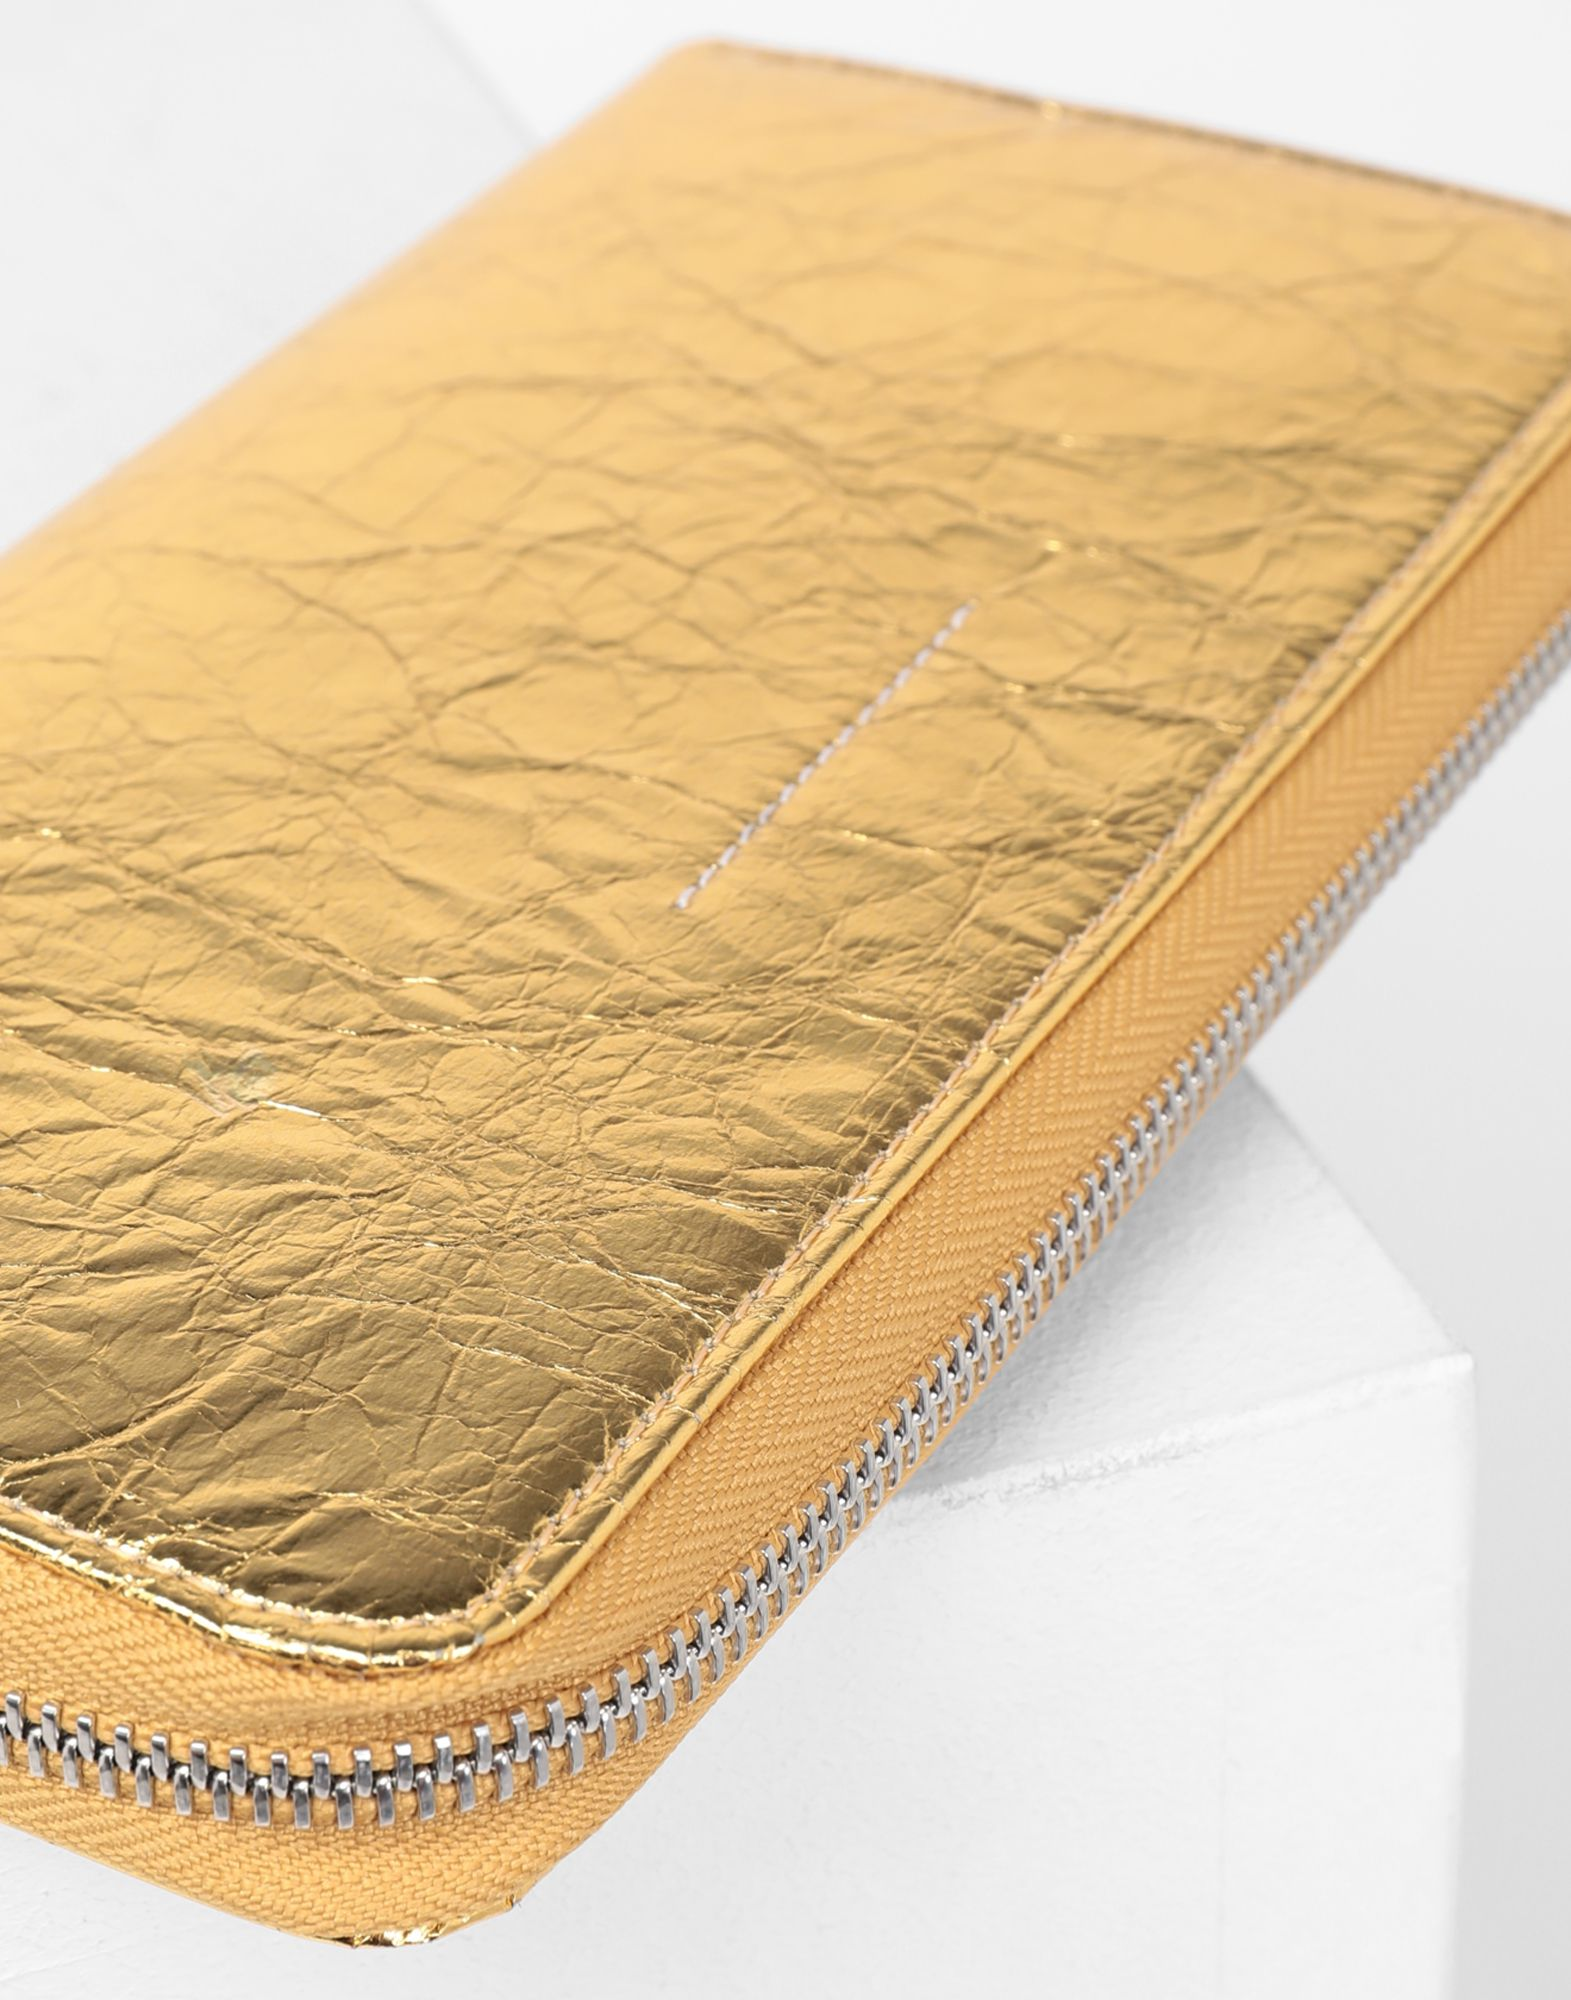 MM6 MAISON MARGIELA Crinkled leather zip long wallet Wallets Woman d